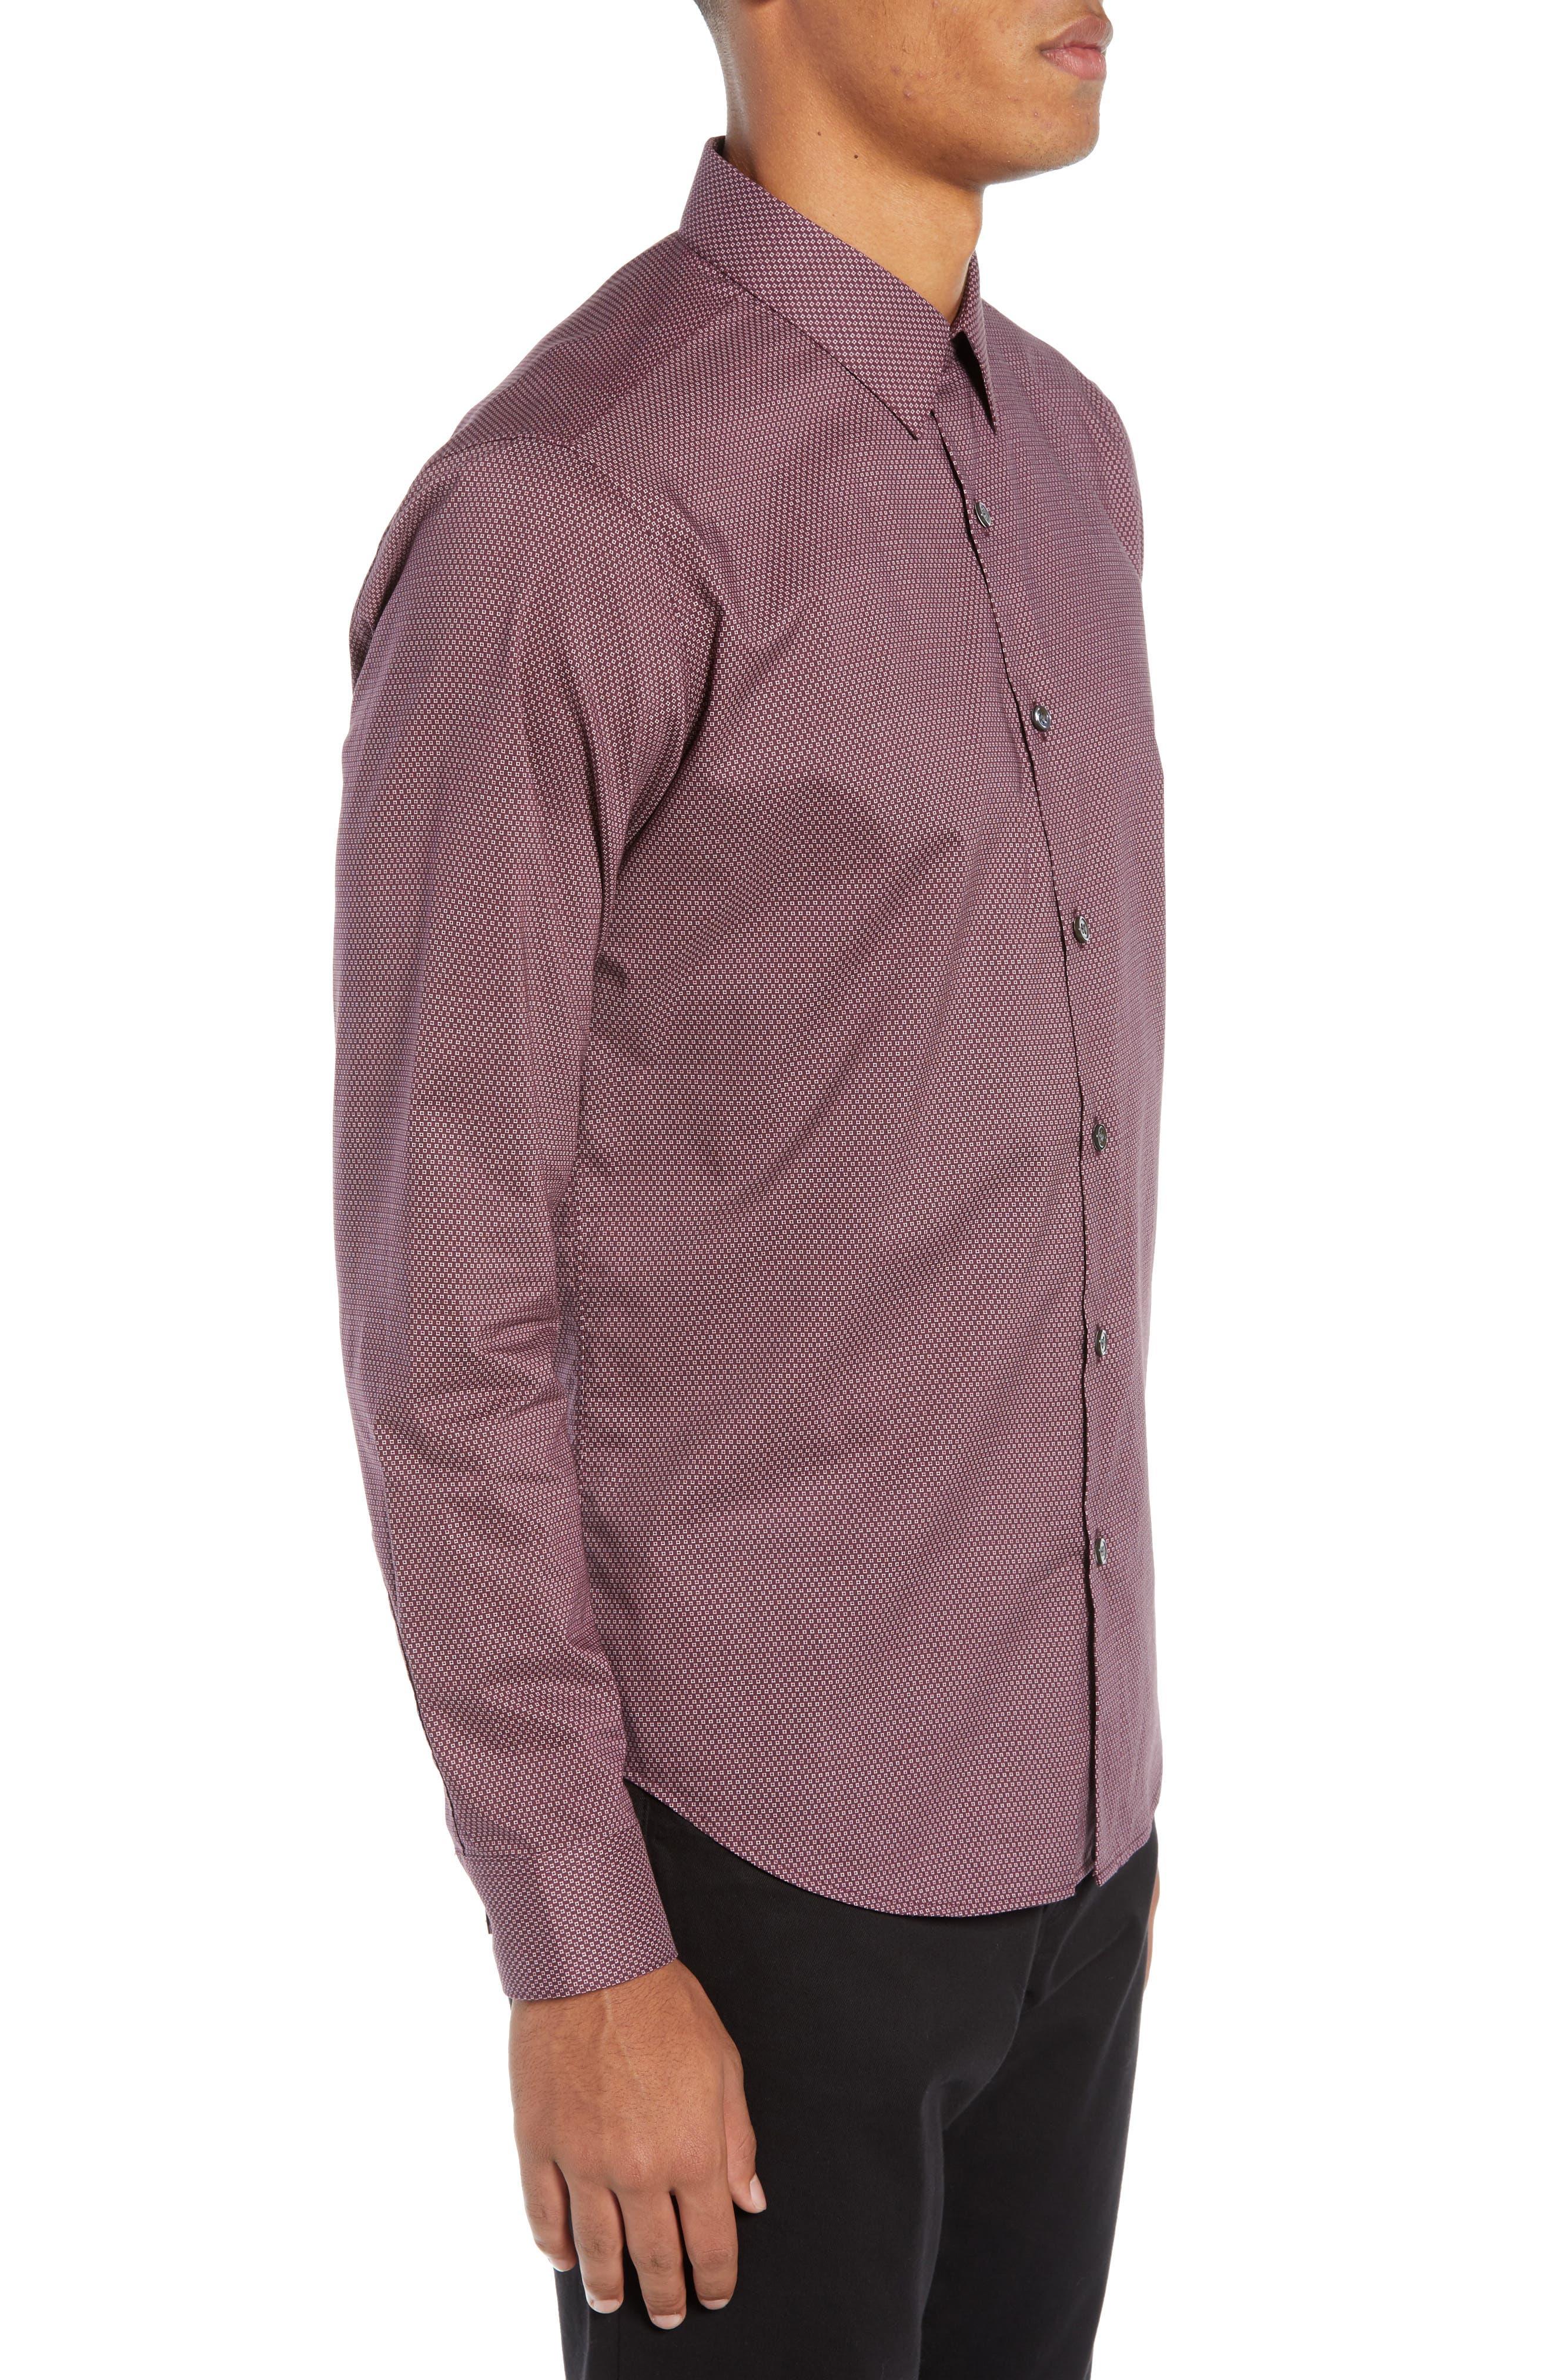 Sylvain Regular Fit Cinder Print Sport Shirt,                             Alternate thumbnail 4, color,                             MALBEC MULTI